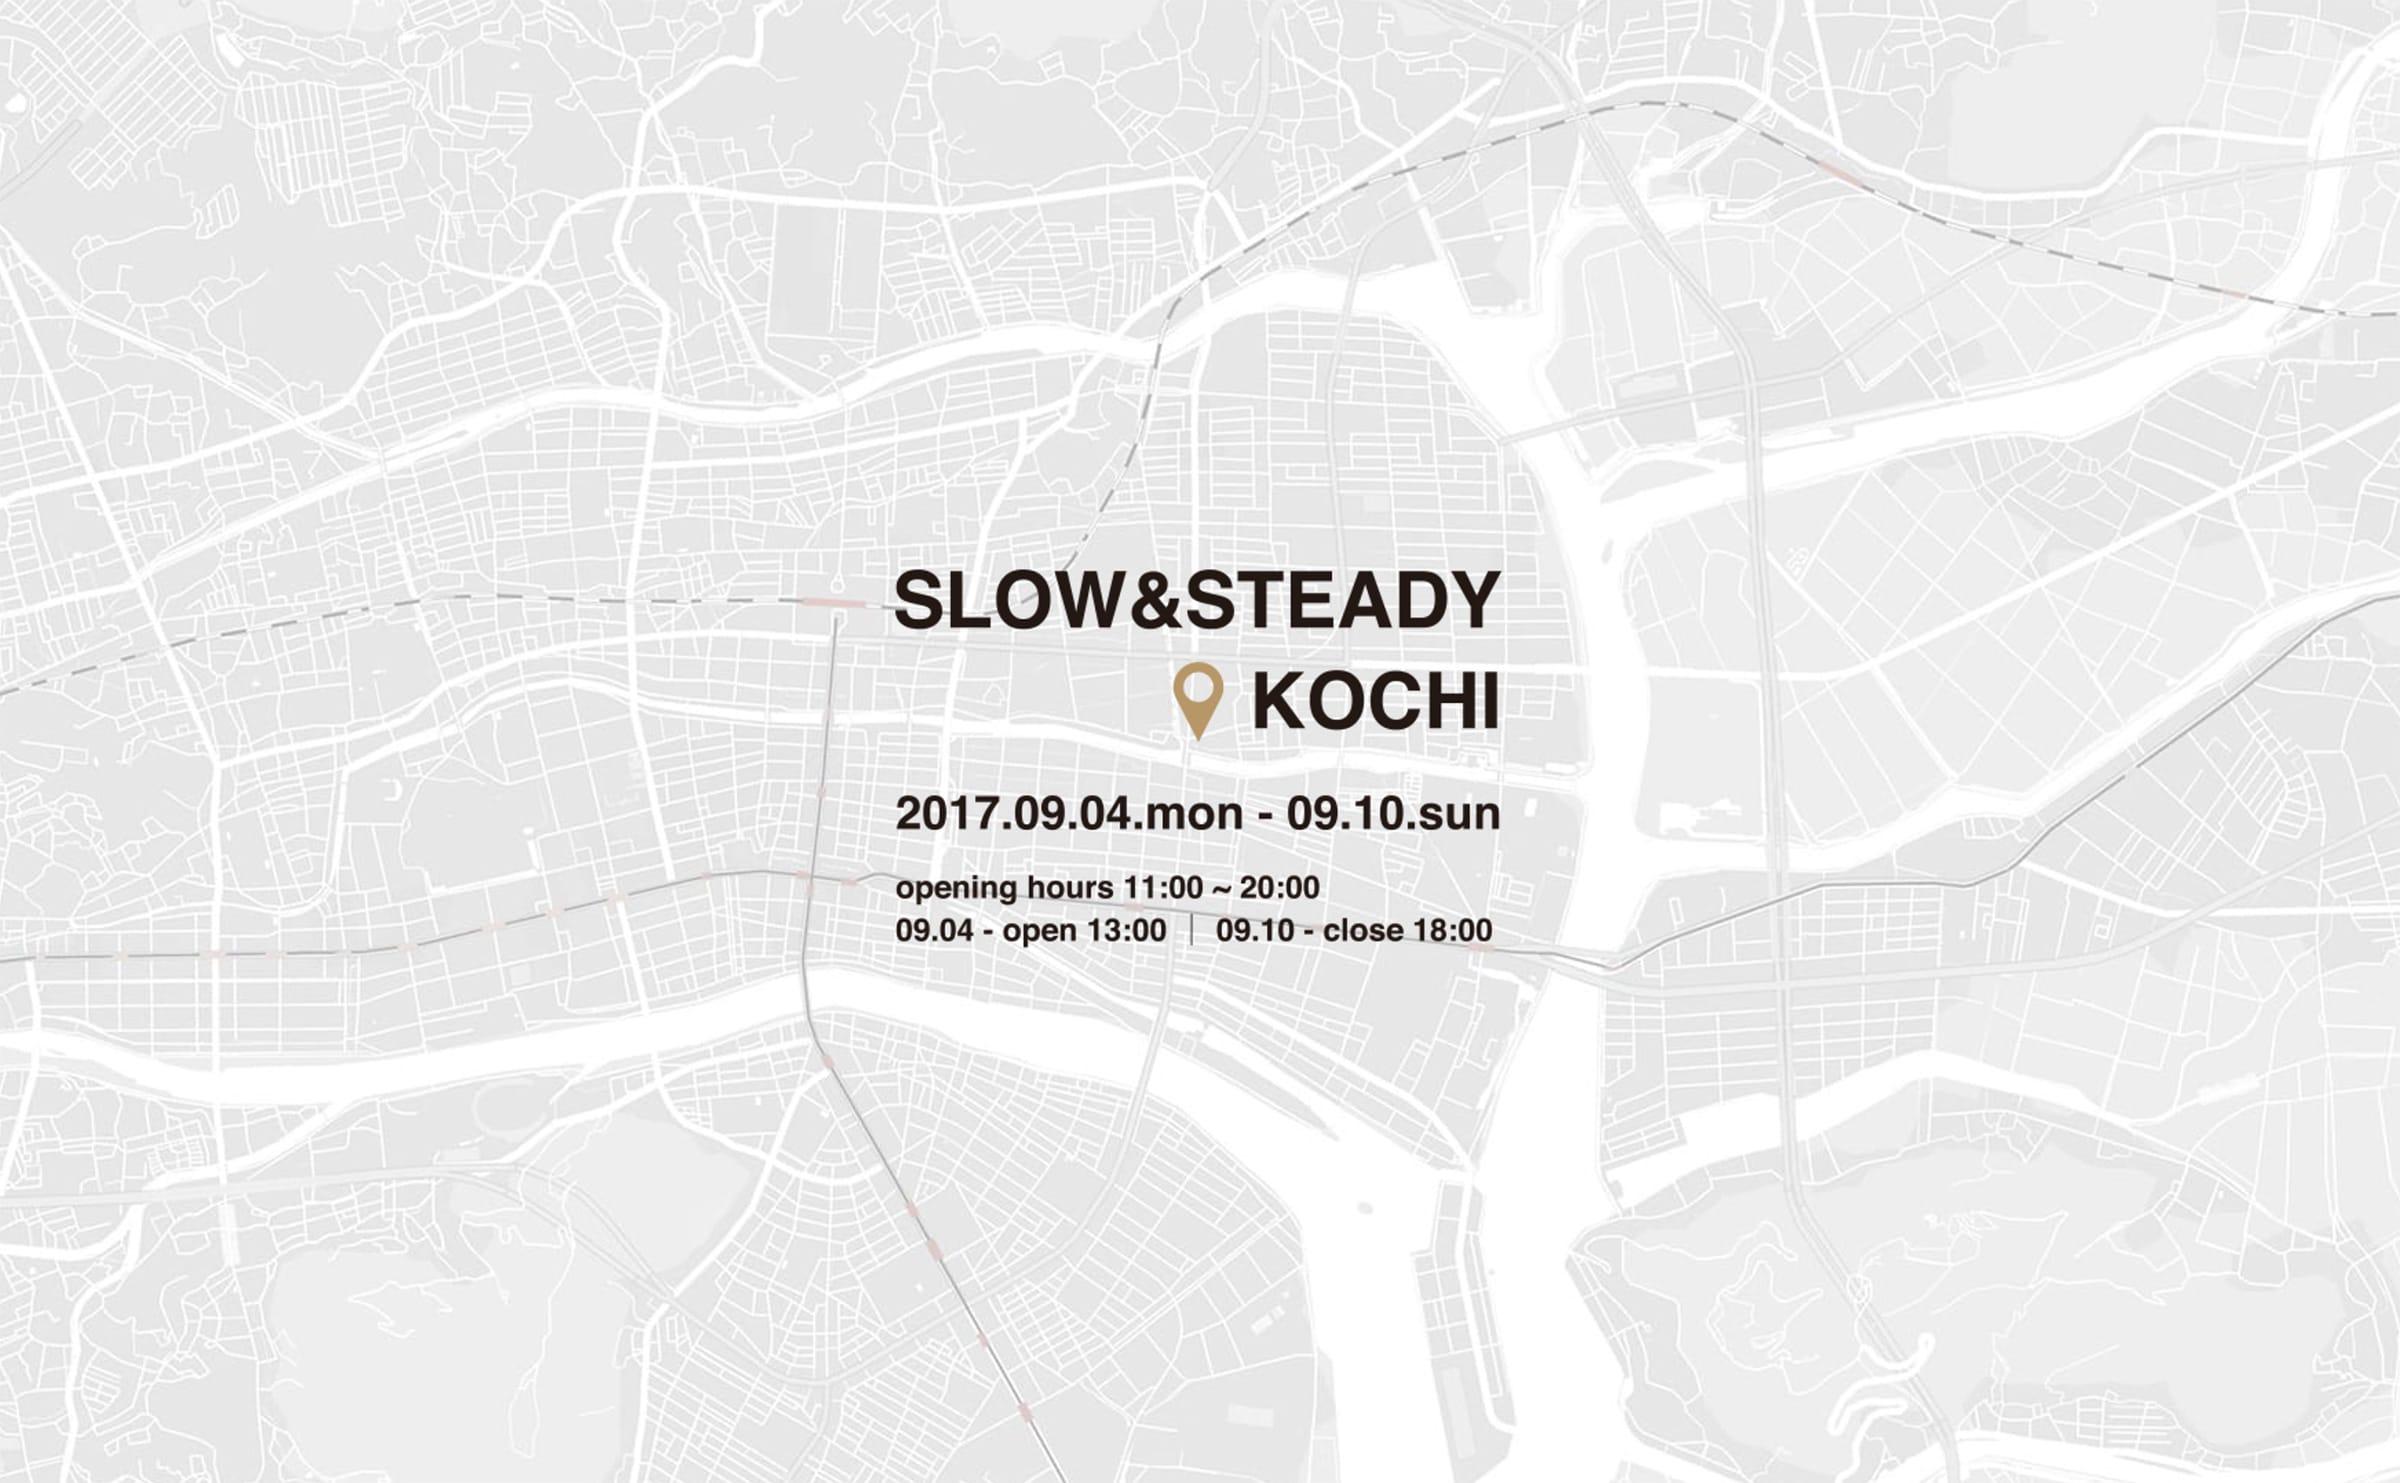 SLOW&STEADY KOCHI 開催のお知らせ